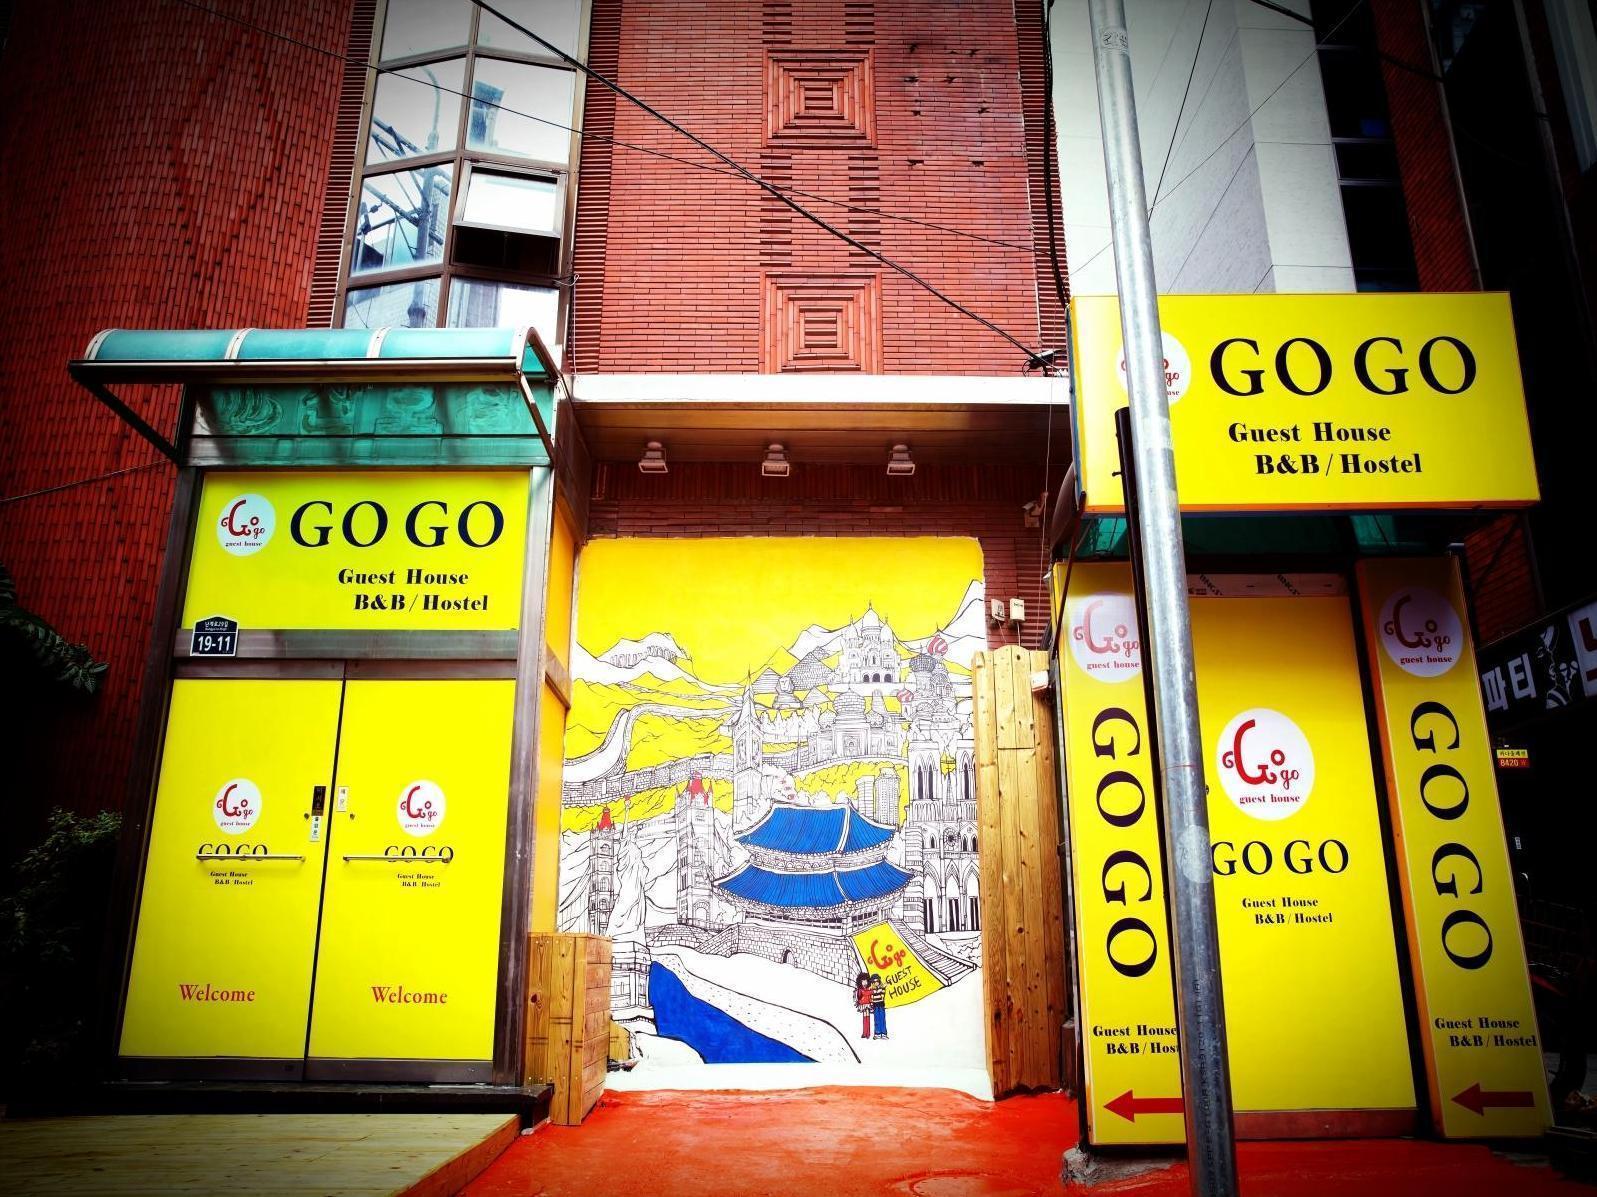 Gogo Guesthouse